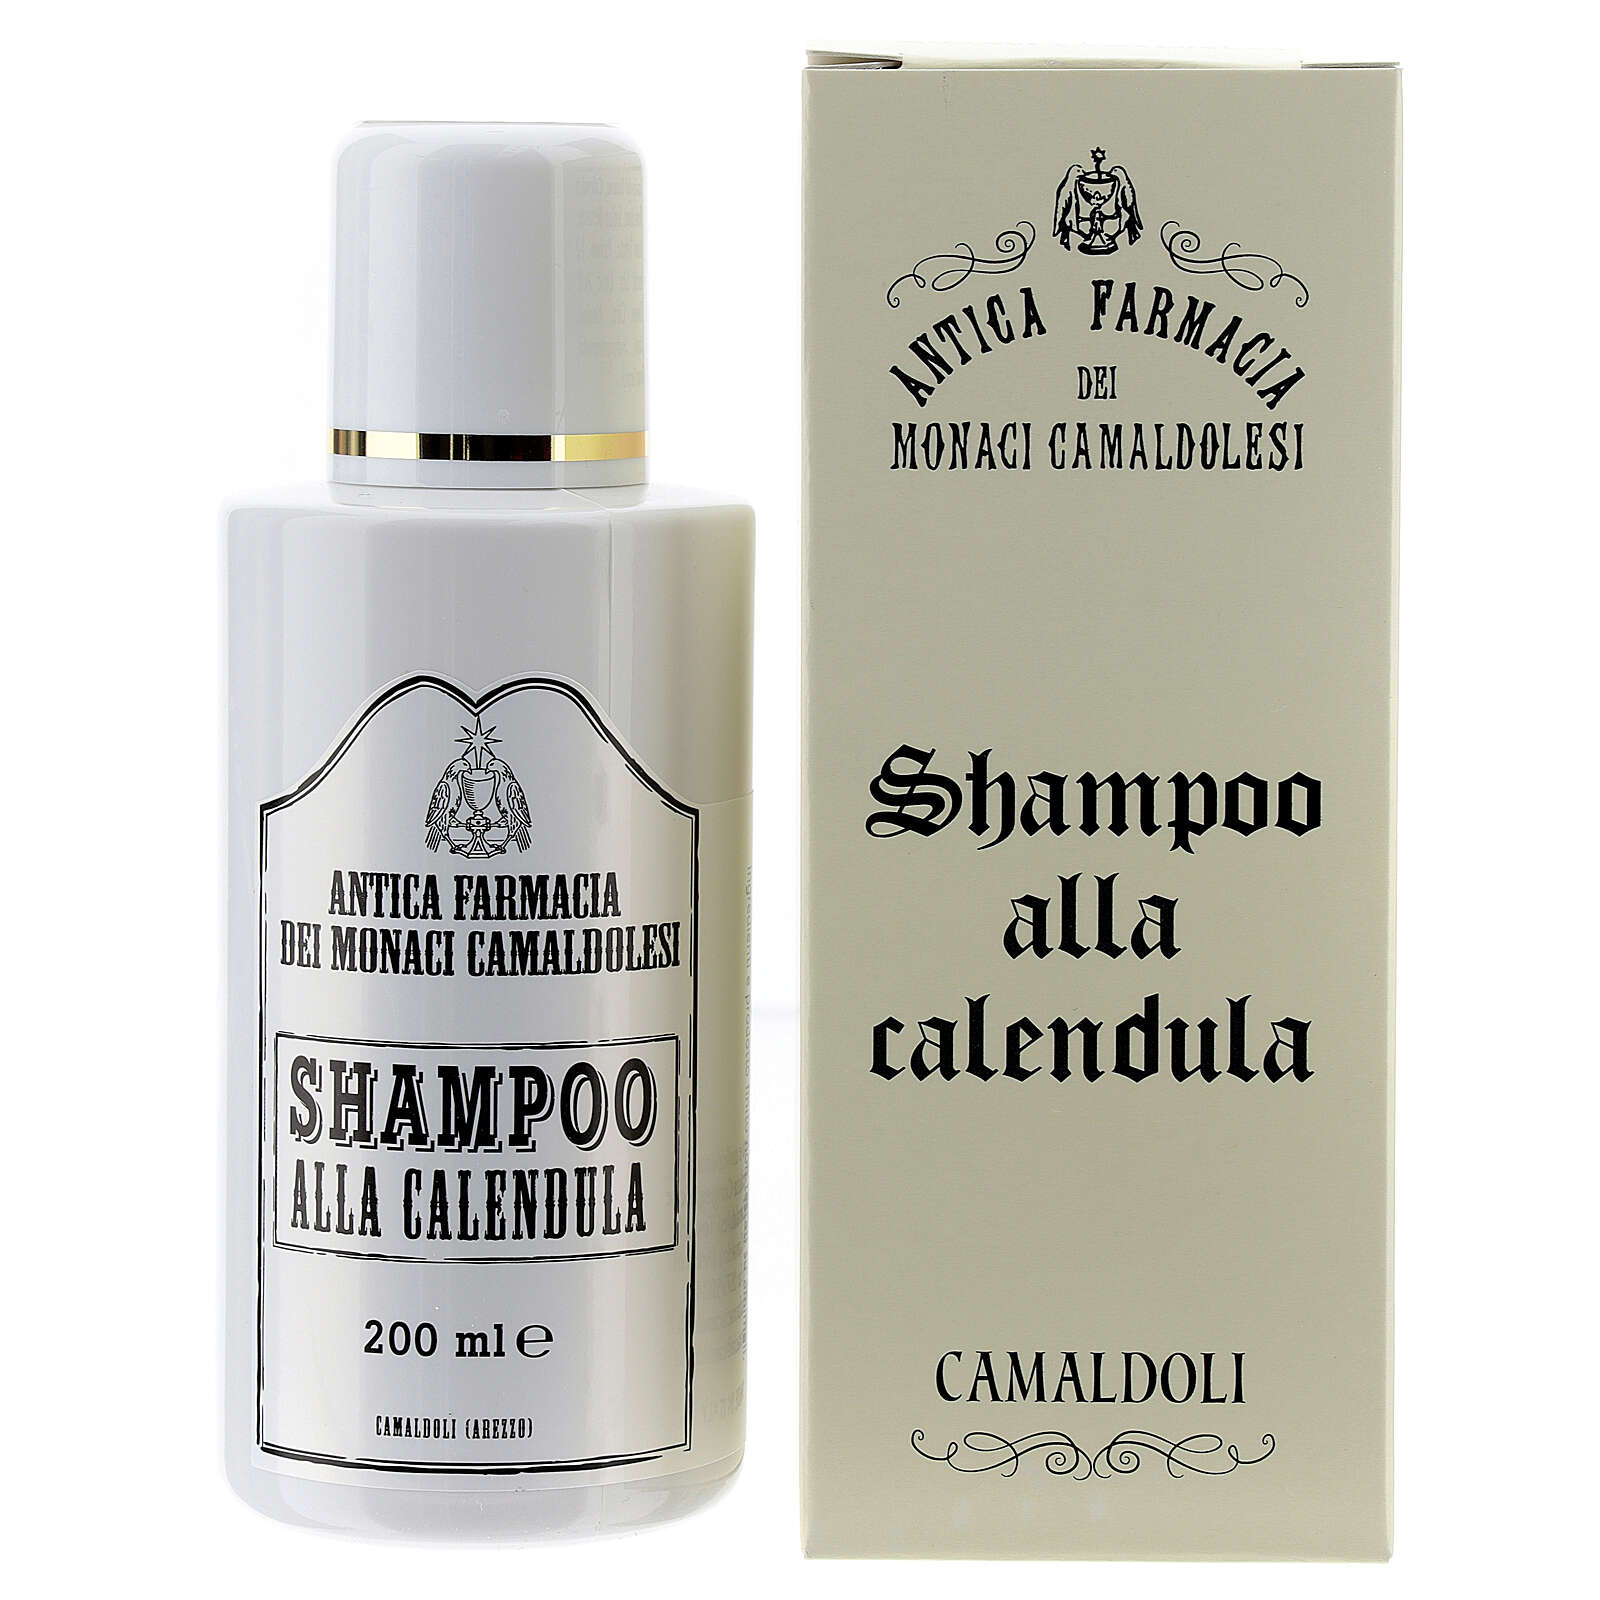 Camaldoli Calendula Shampoo (200 ml) 4